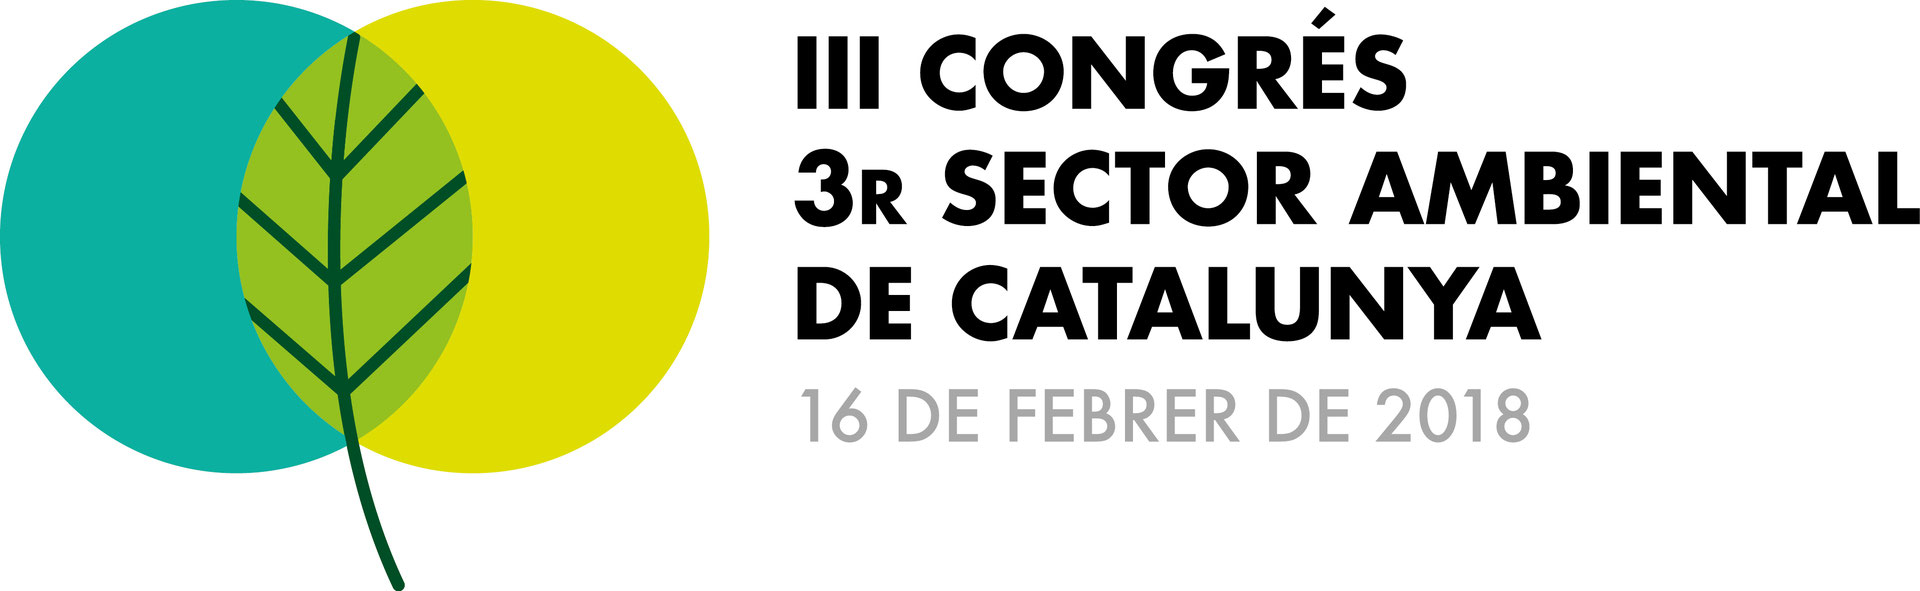 (c) 3congrestsa.cat